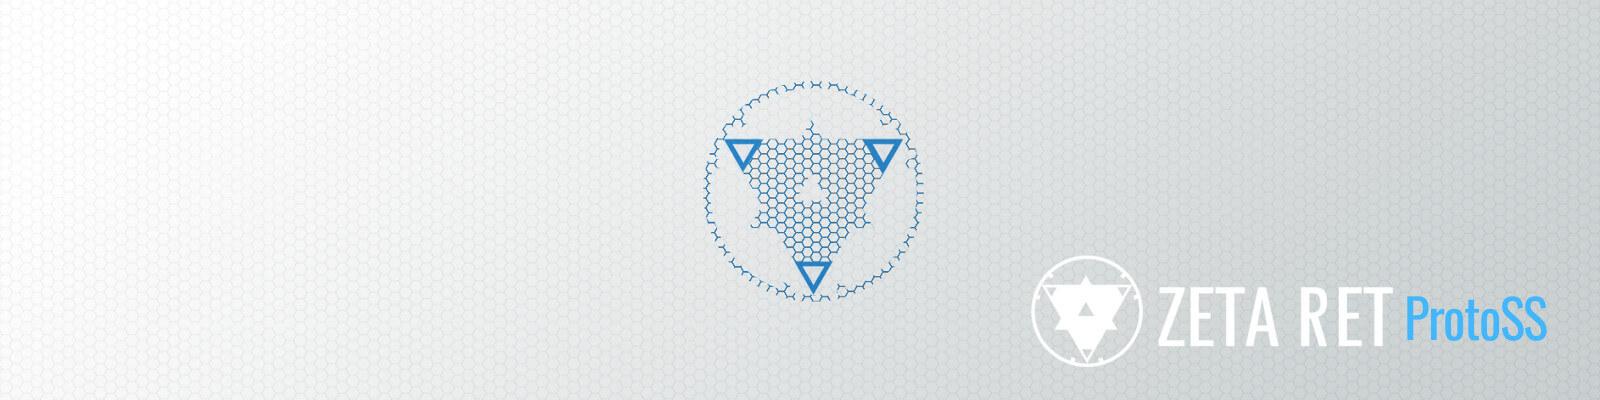 Zeta Ret ProtoSS Cover